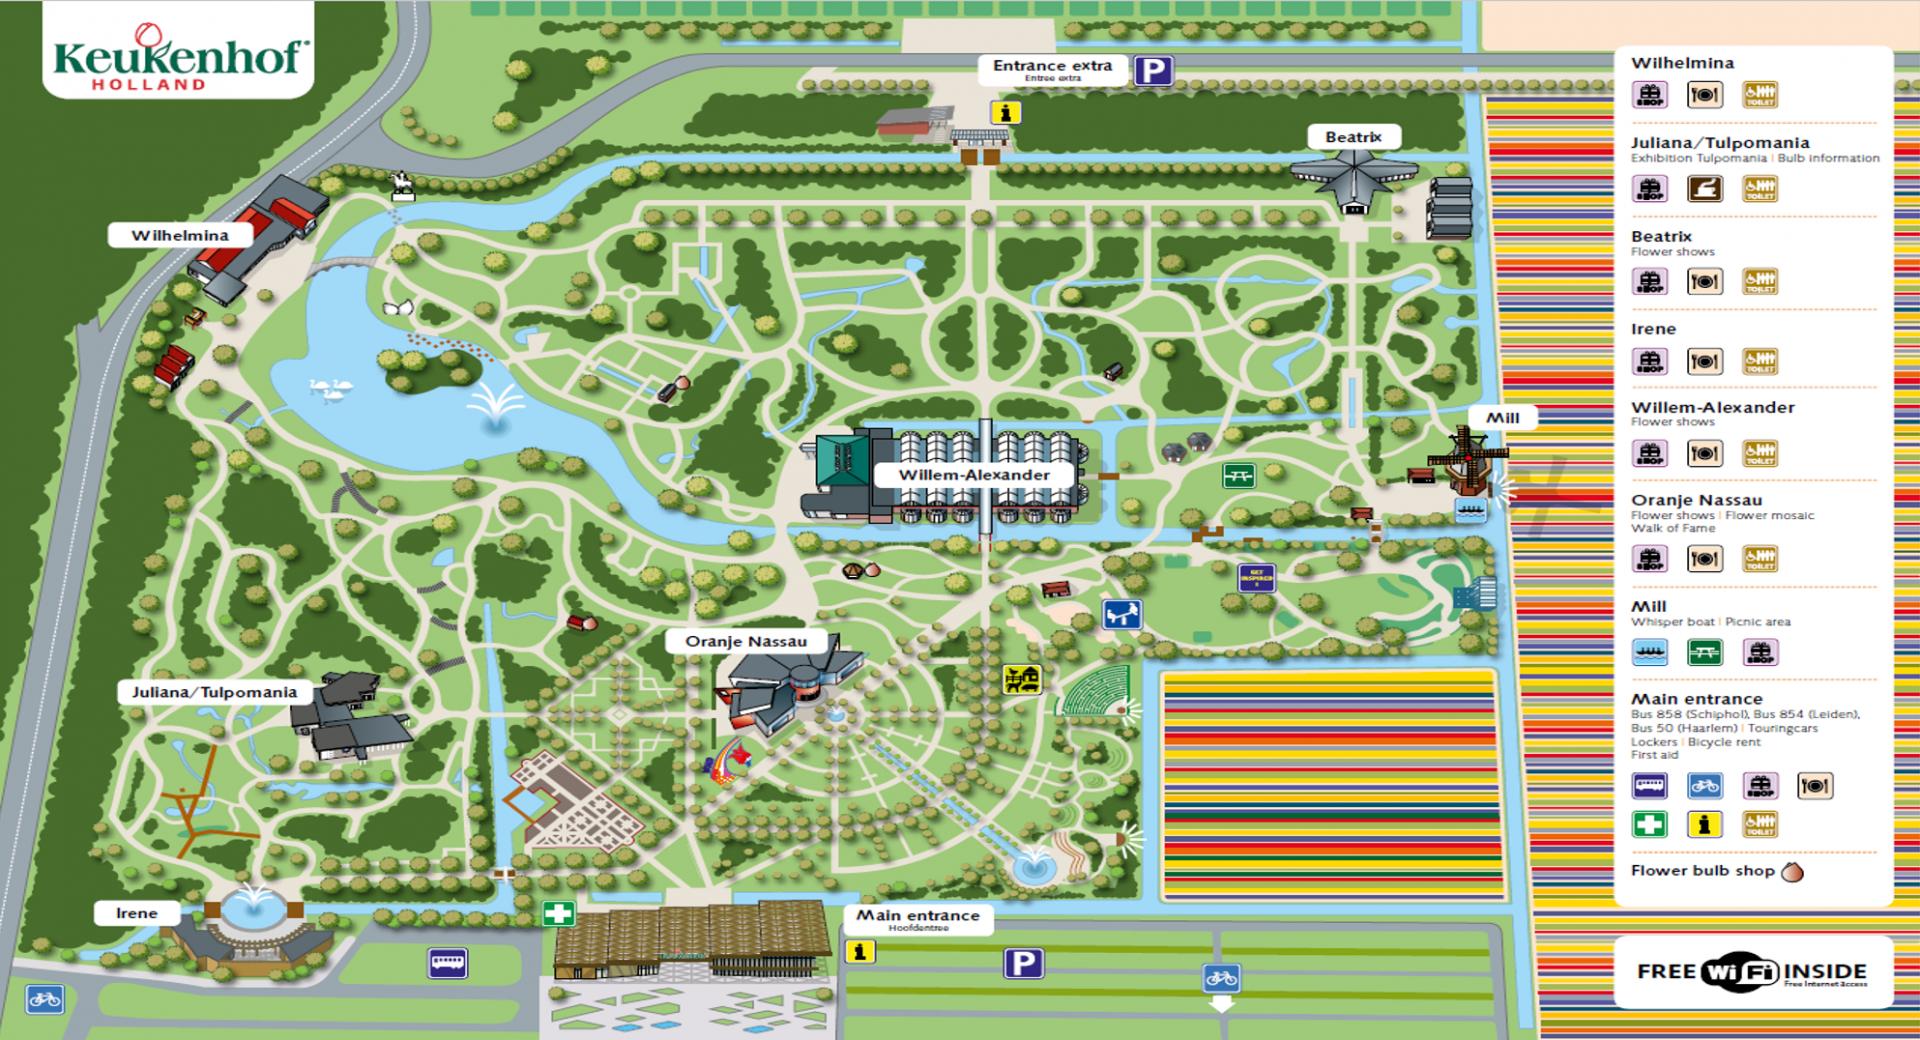 plattegrond2020